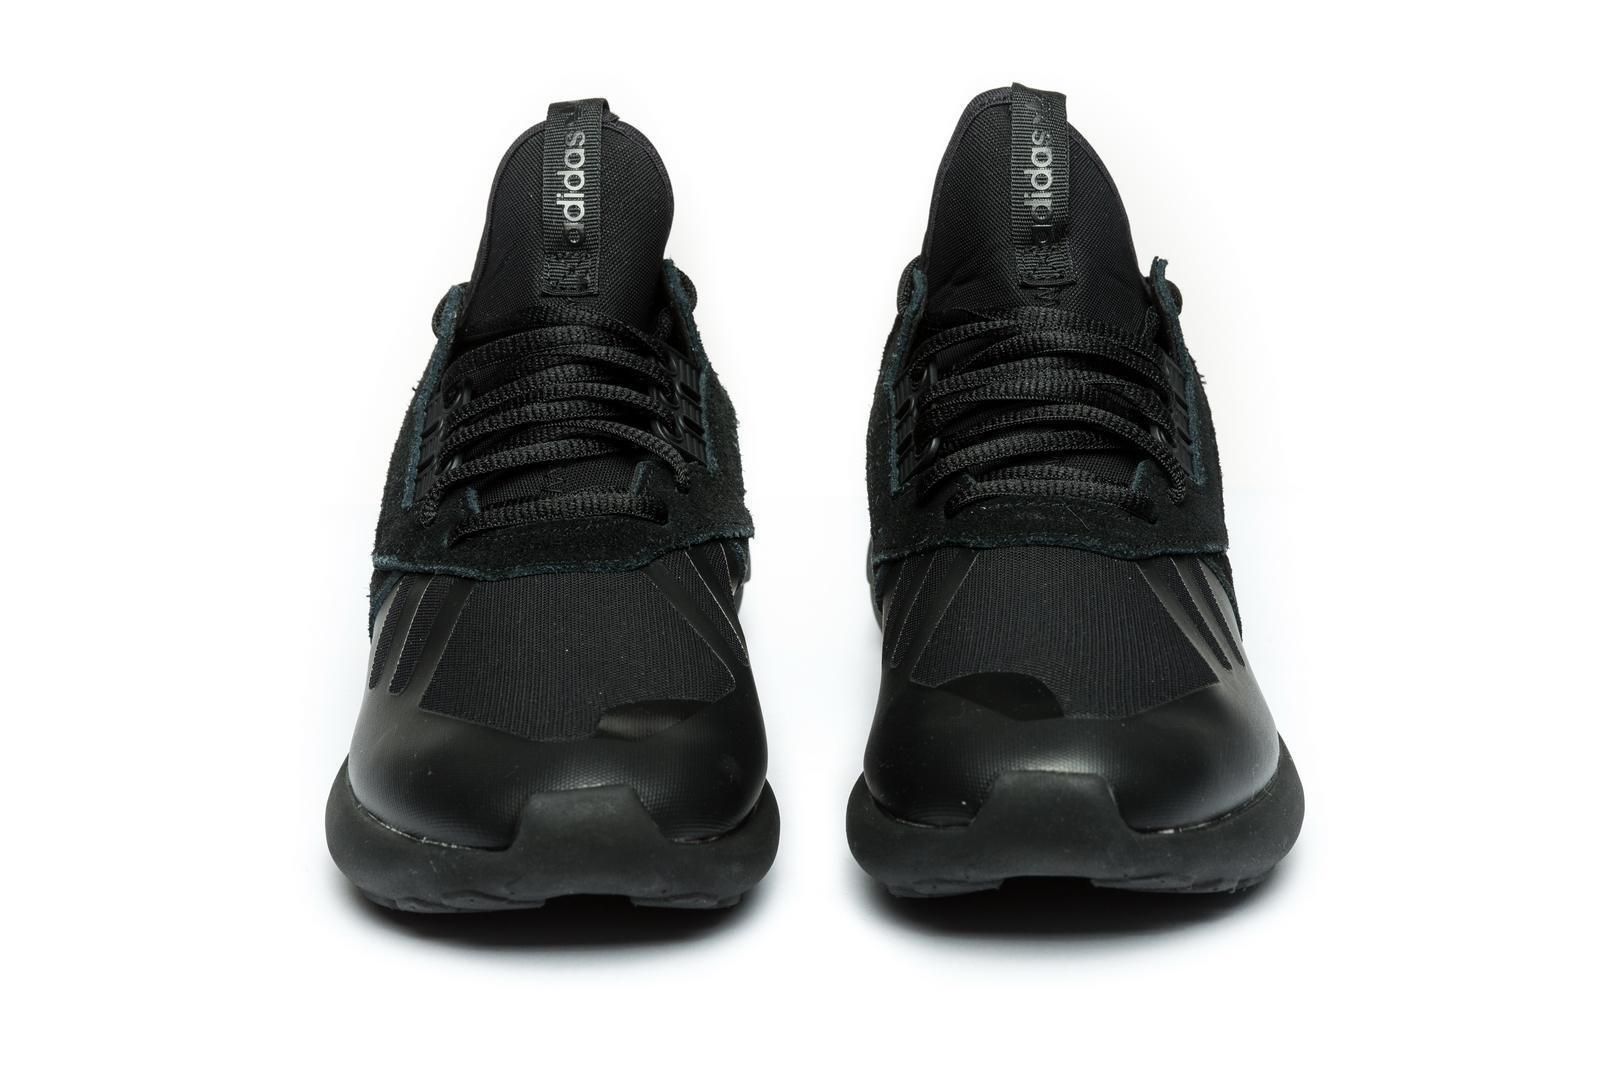 New homme adidas Trainers noir Tubular Doom Sock Primeknit Textile